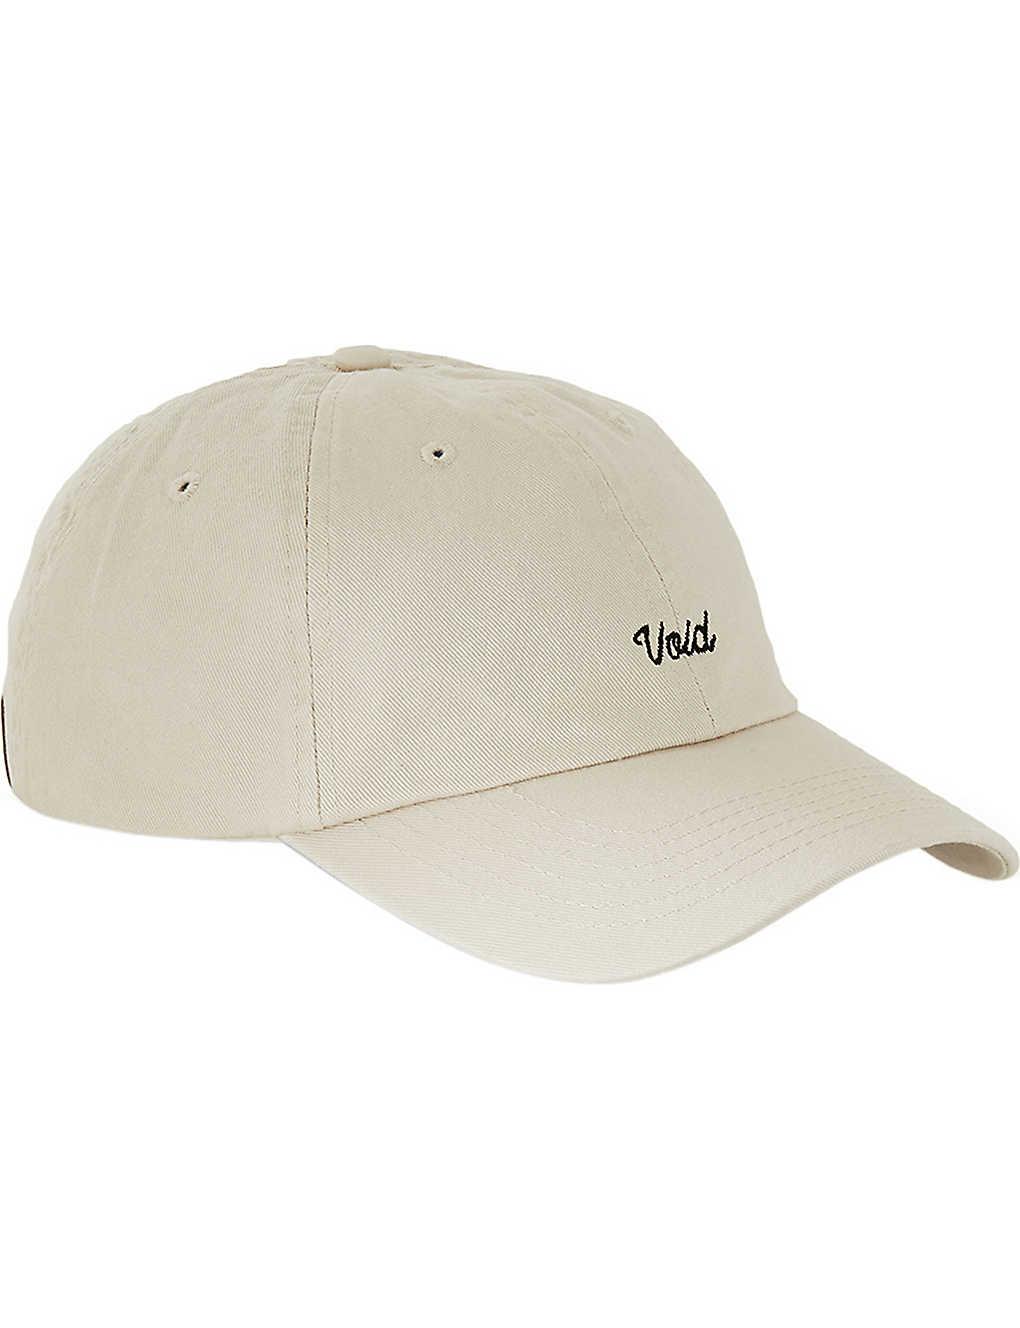 921ac1e0d TOPMAN - Void strapback cap | Selfridges.com